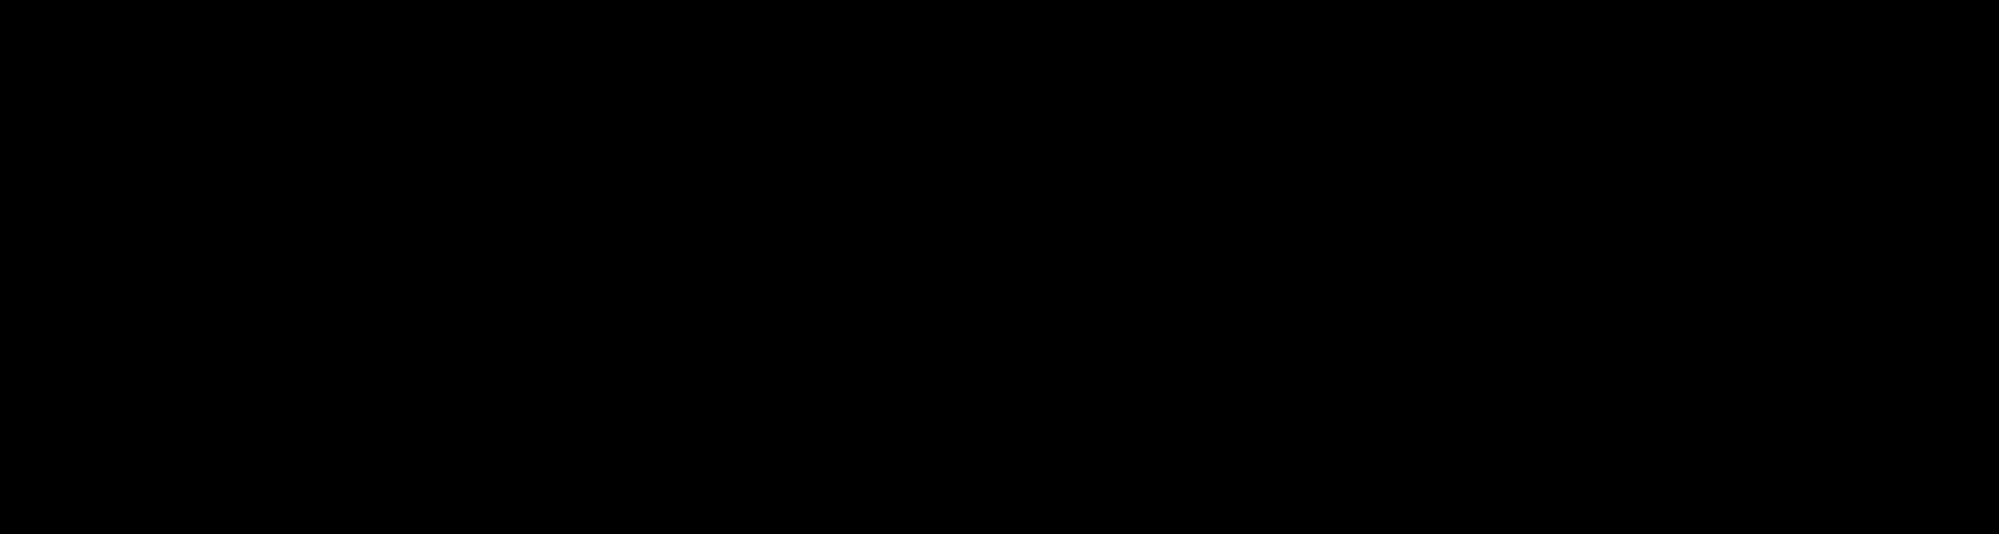 Custom Rom for Android - AICP ROM